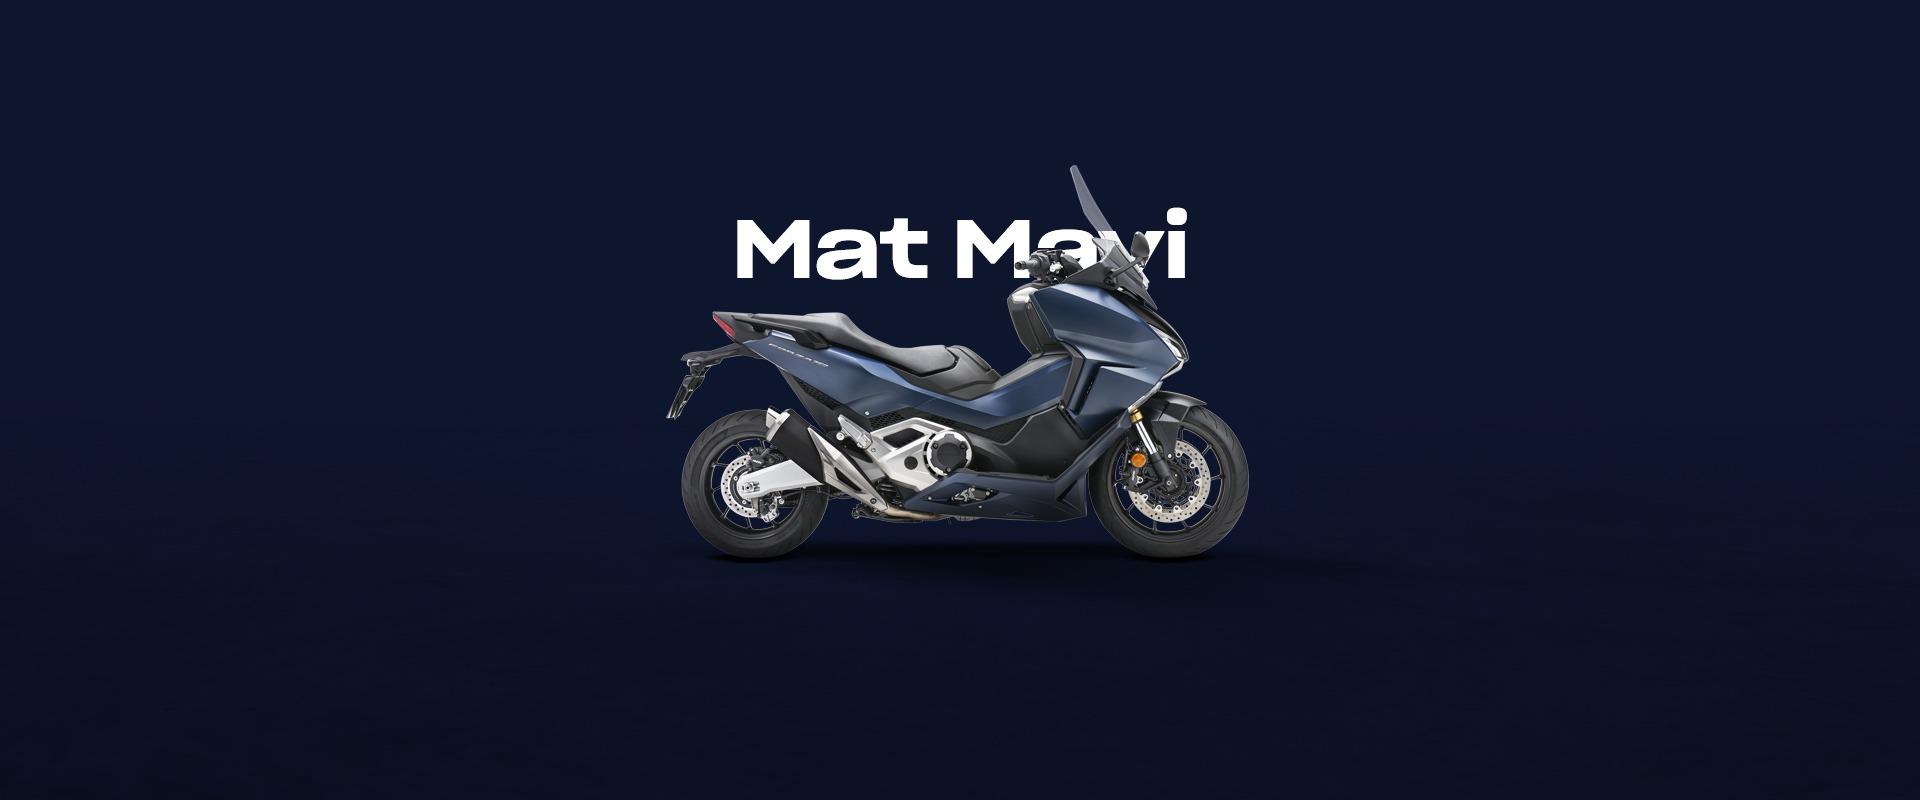 DRD Motorbikes Mat Mavi